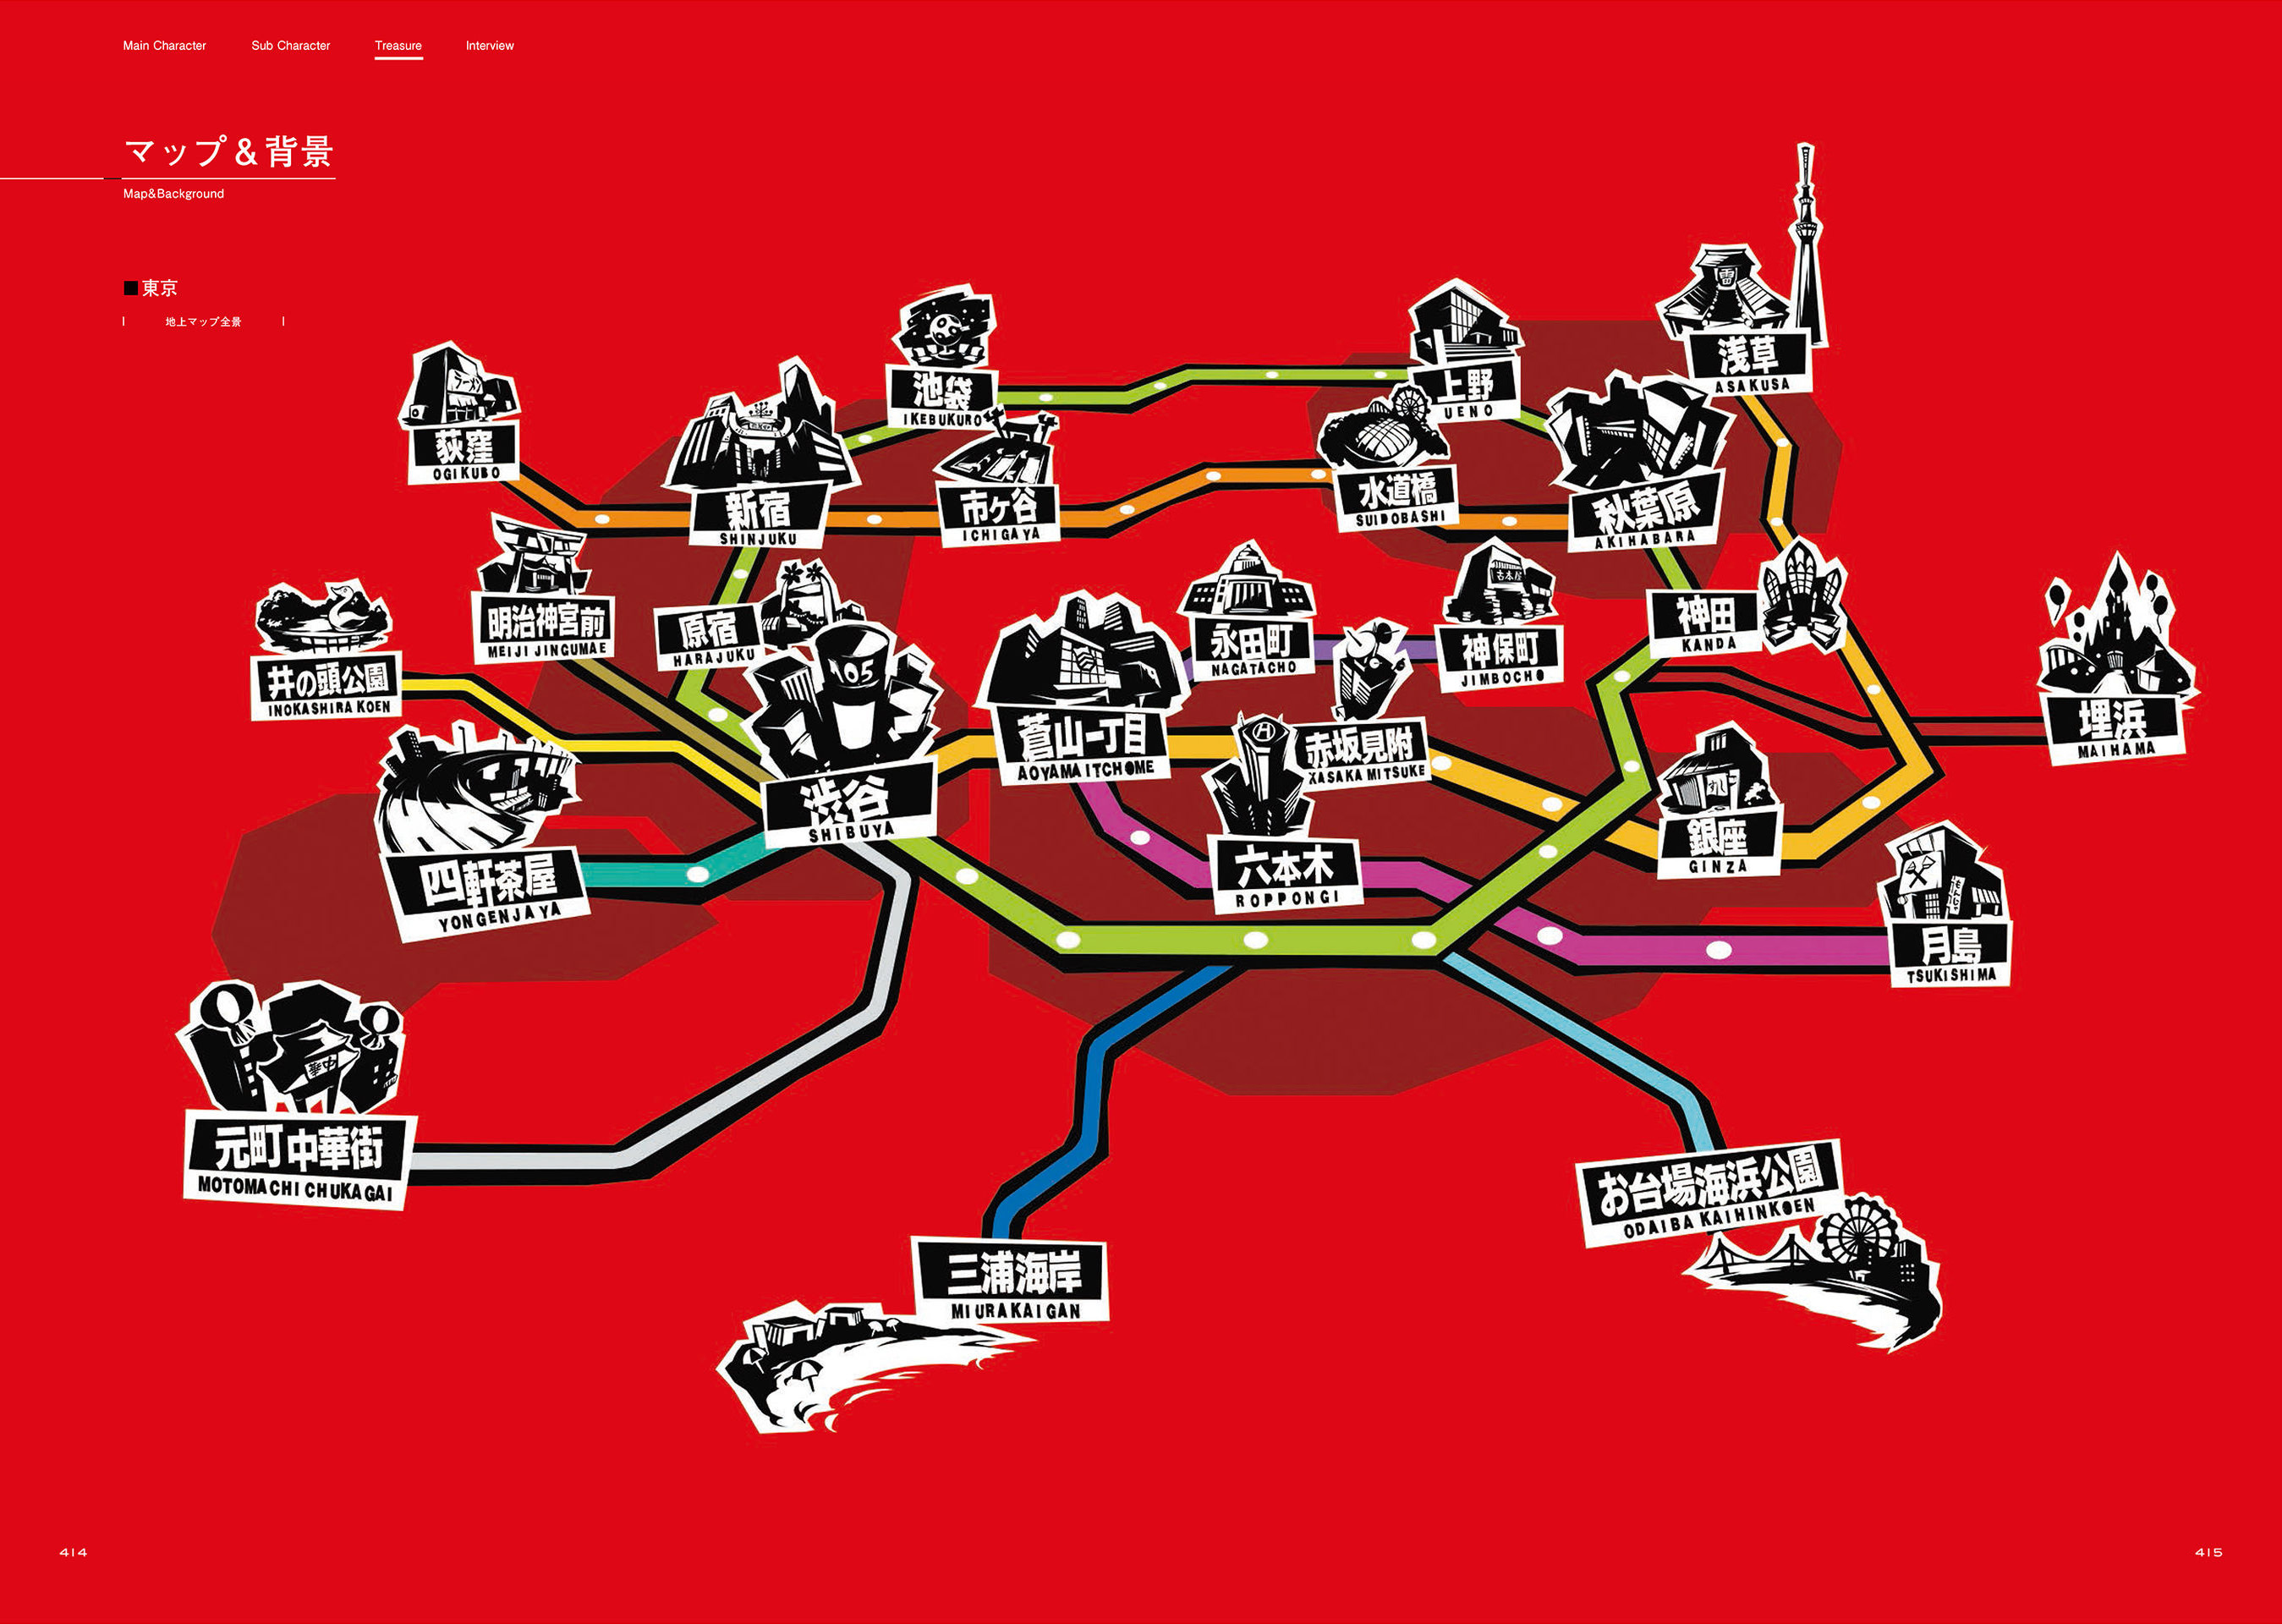 Tokyo Megami Tensei Wiki FANDOM Powered By Wikia - Japan map persona 4